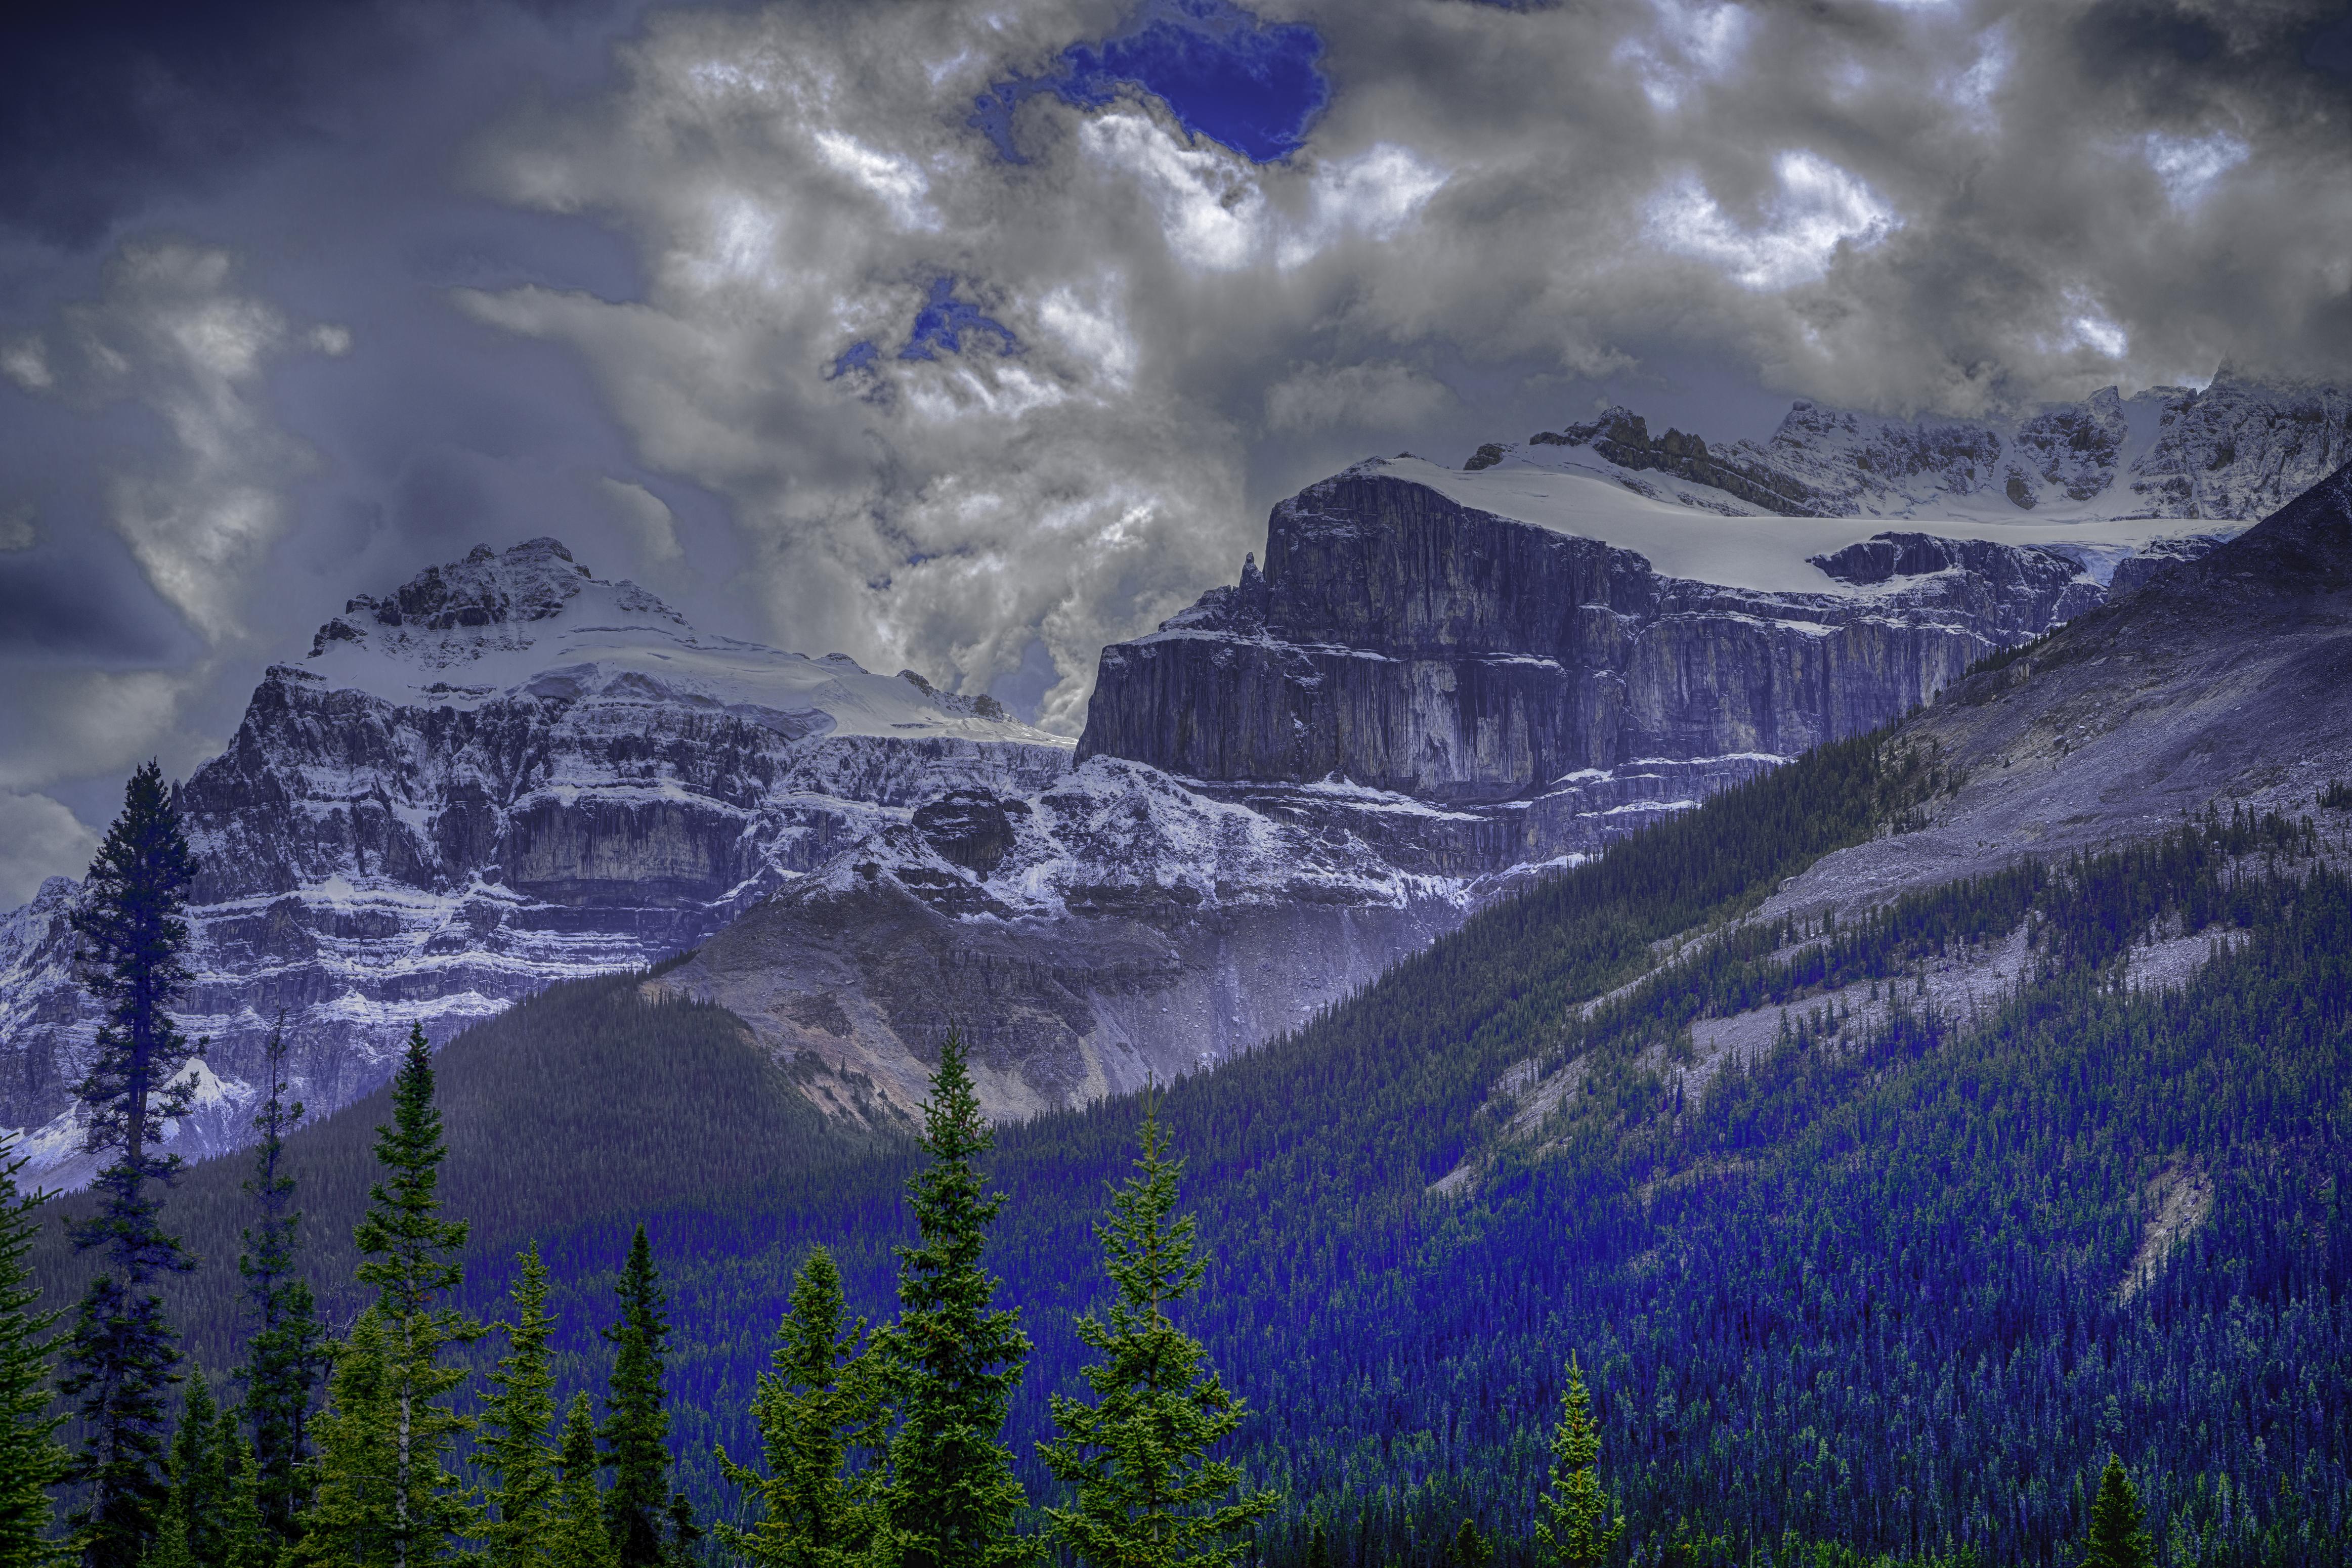 Fairview Mtn, Canadian Rockies